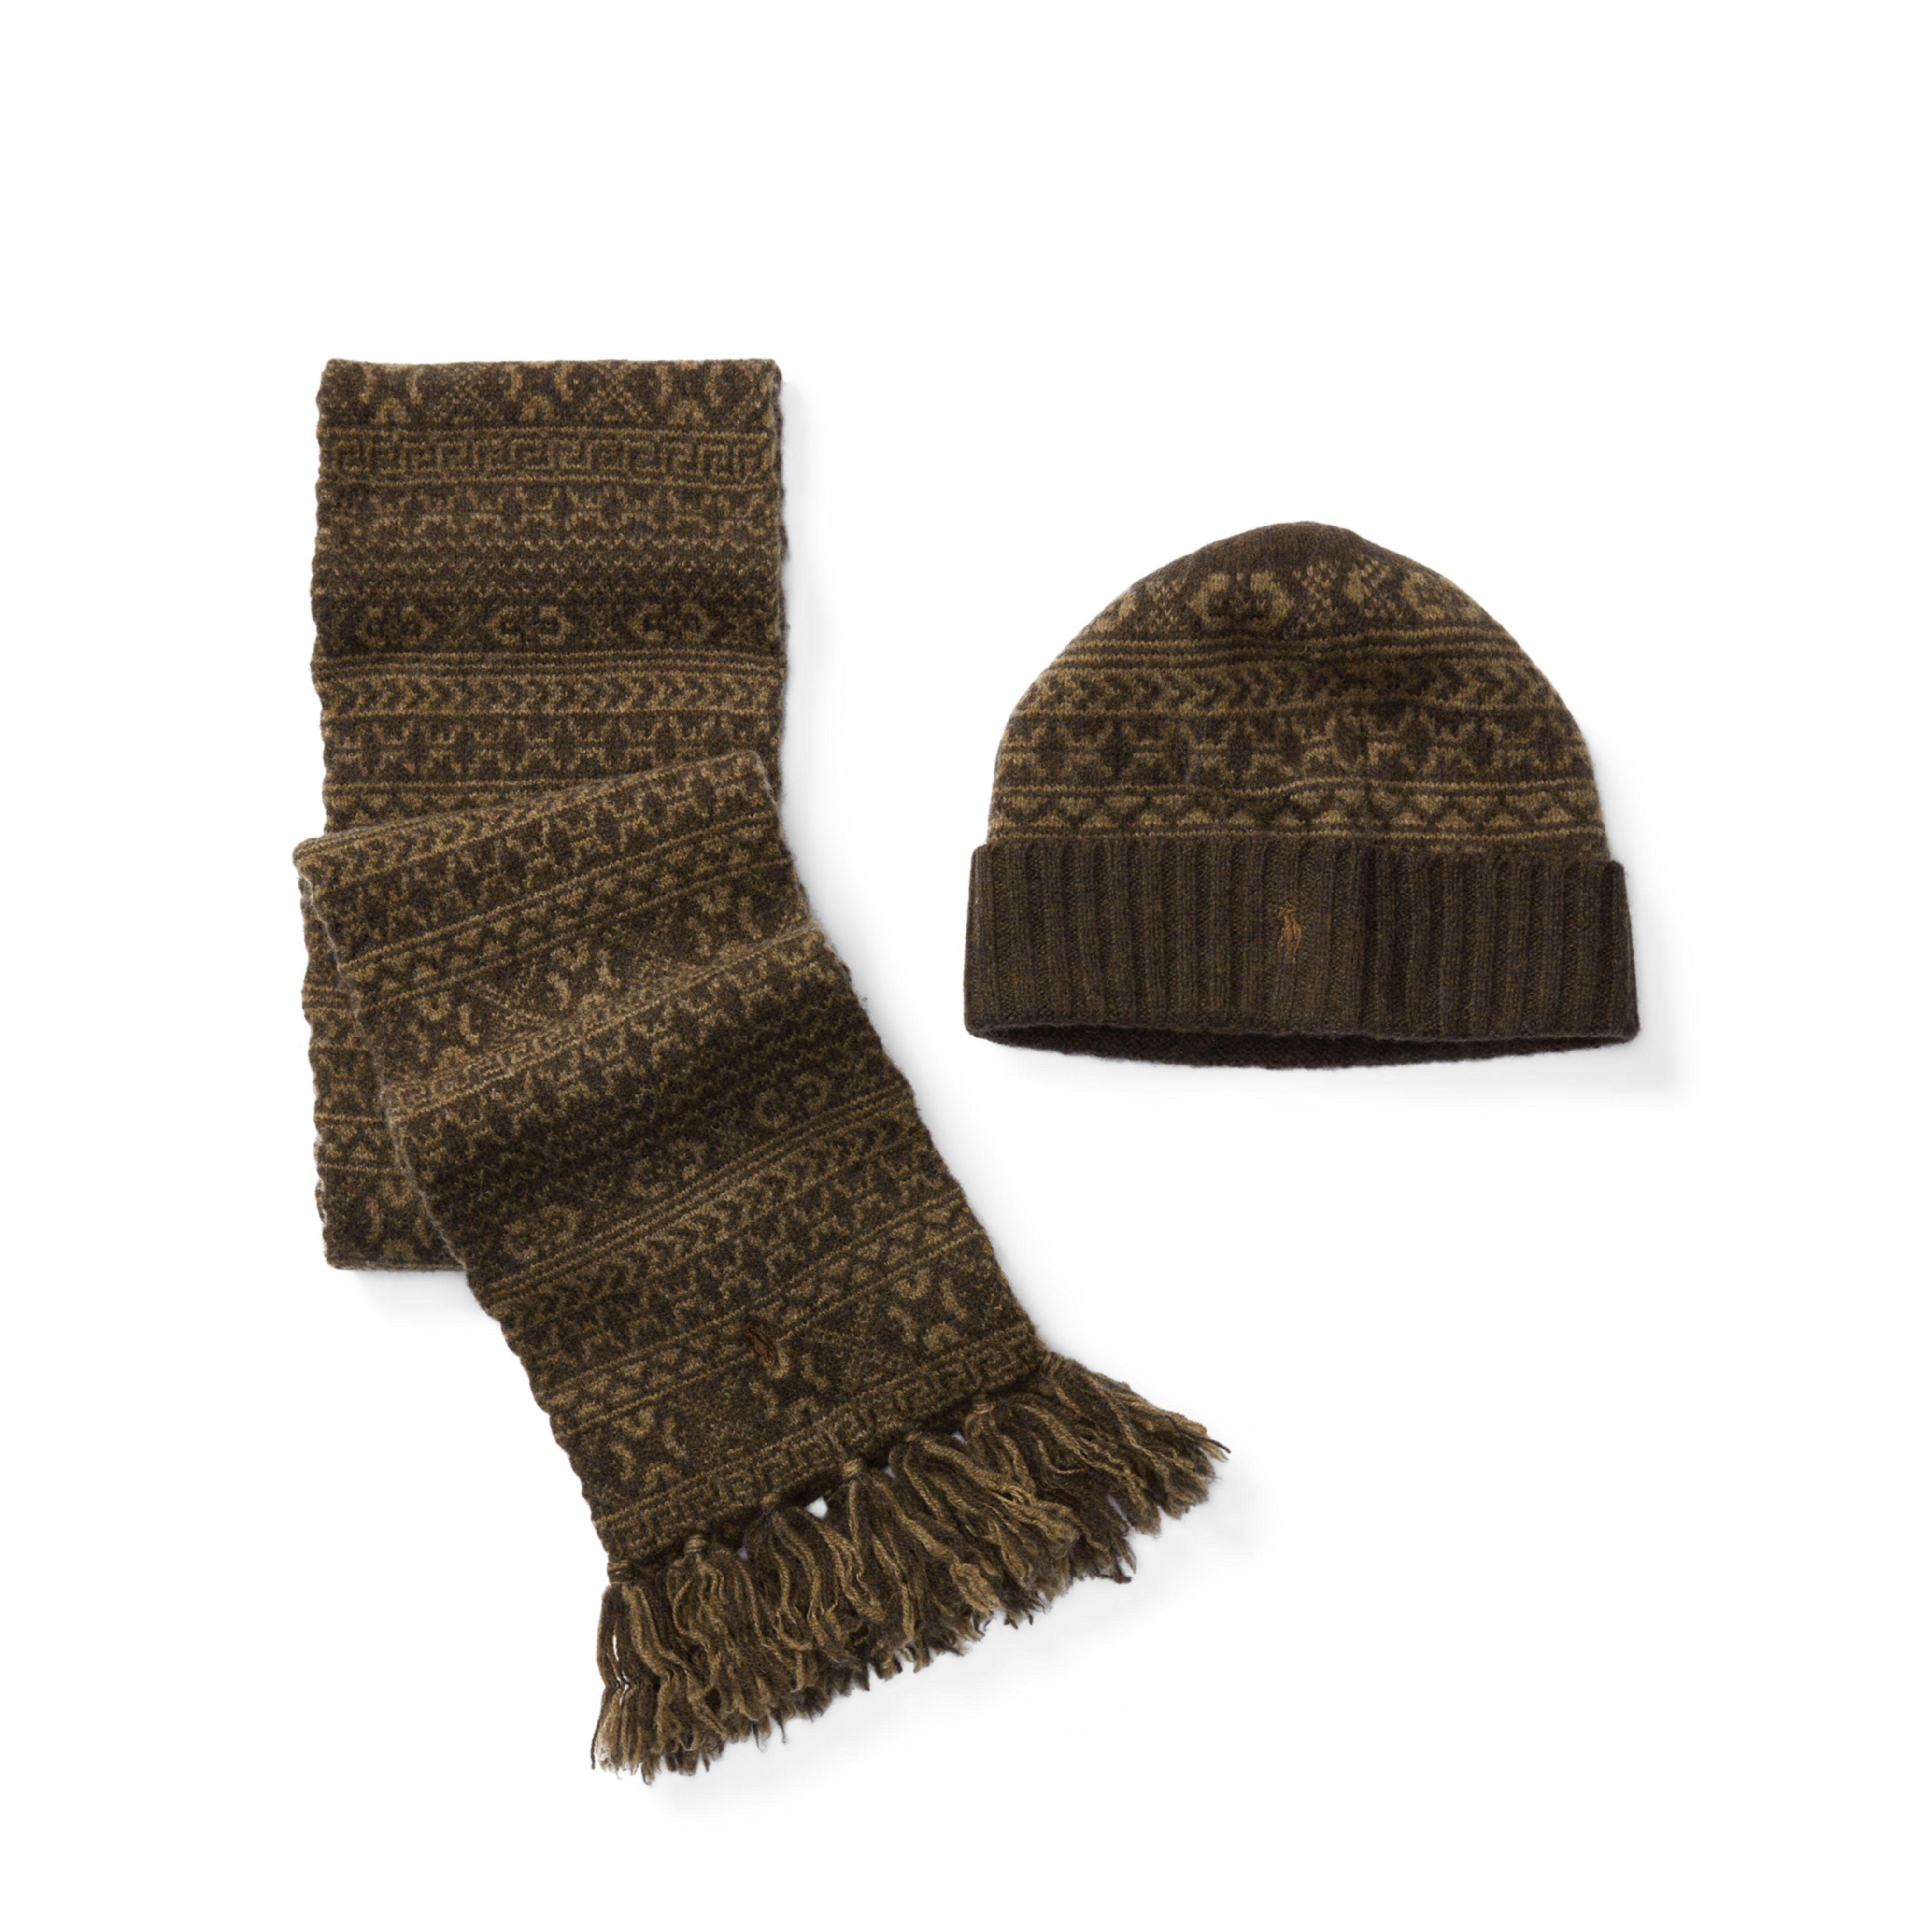 f52680c670431 ... cheap lyst polo ralph lauren fair isle hat scarf gift set in black for  men b15bf